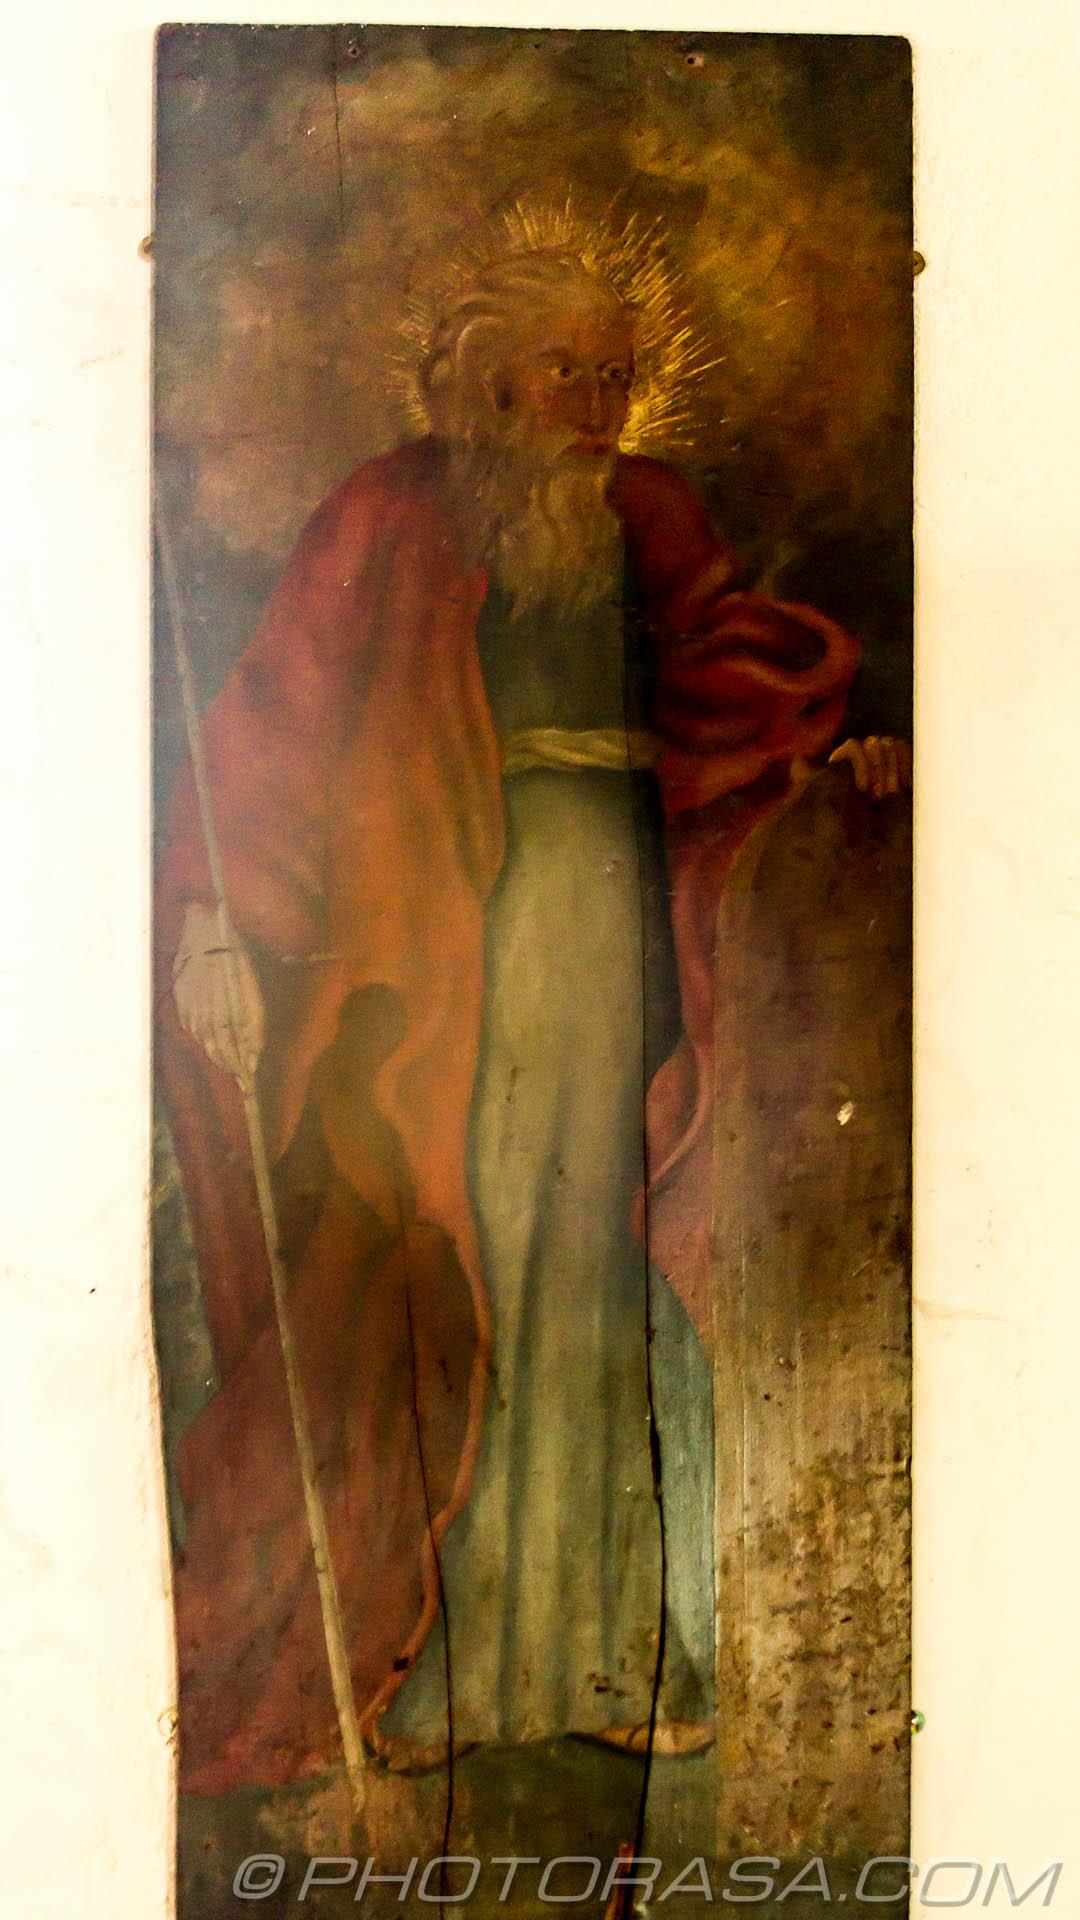 http://photorasa.com/parish-church-st-peter-st-paul-headcorn/17th-century-painted-panel-of-moses/